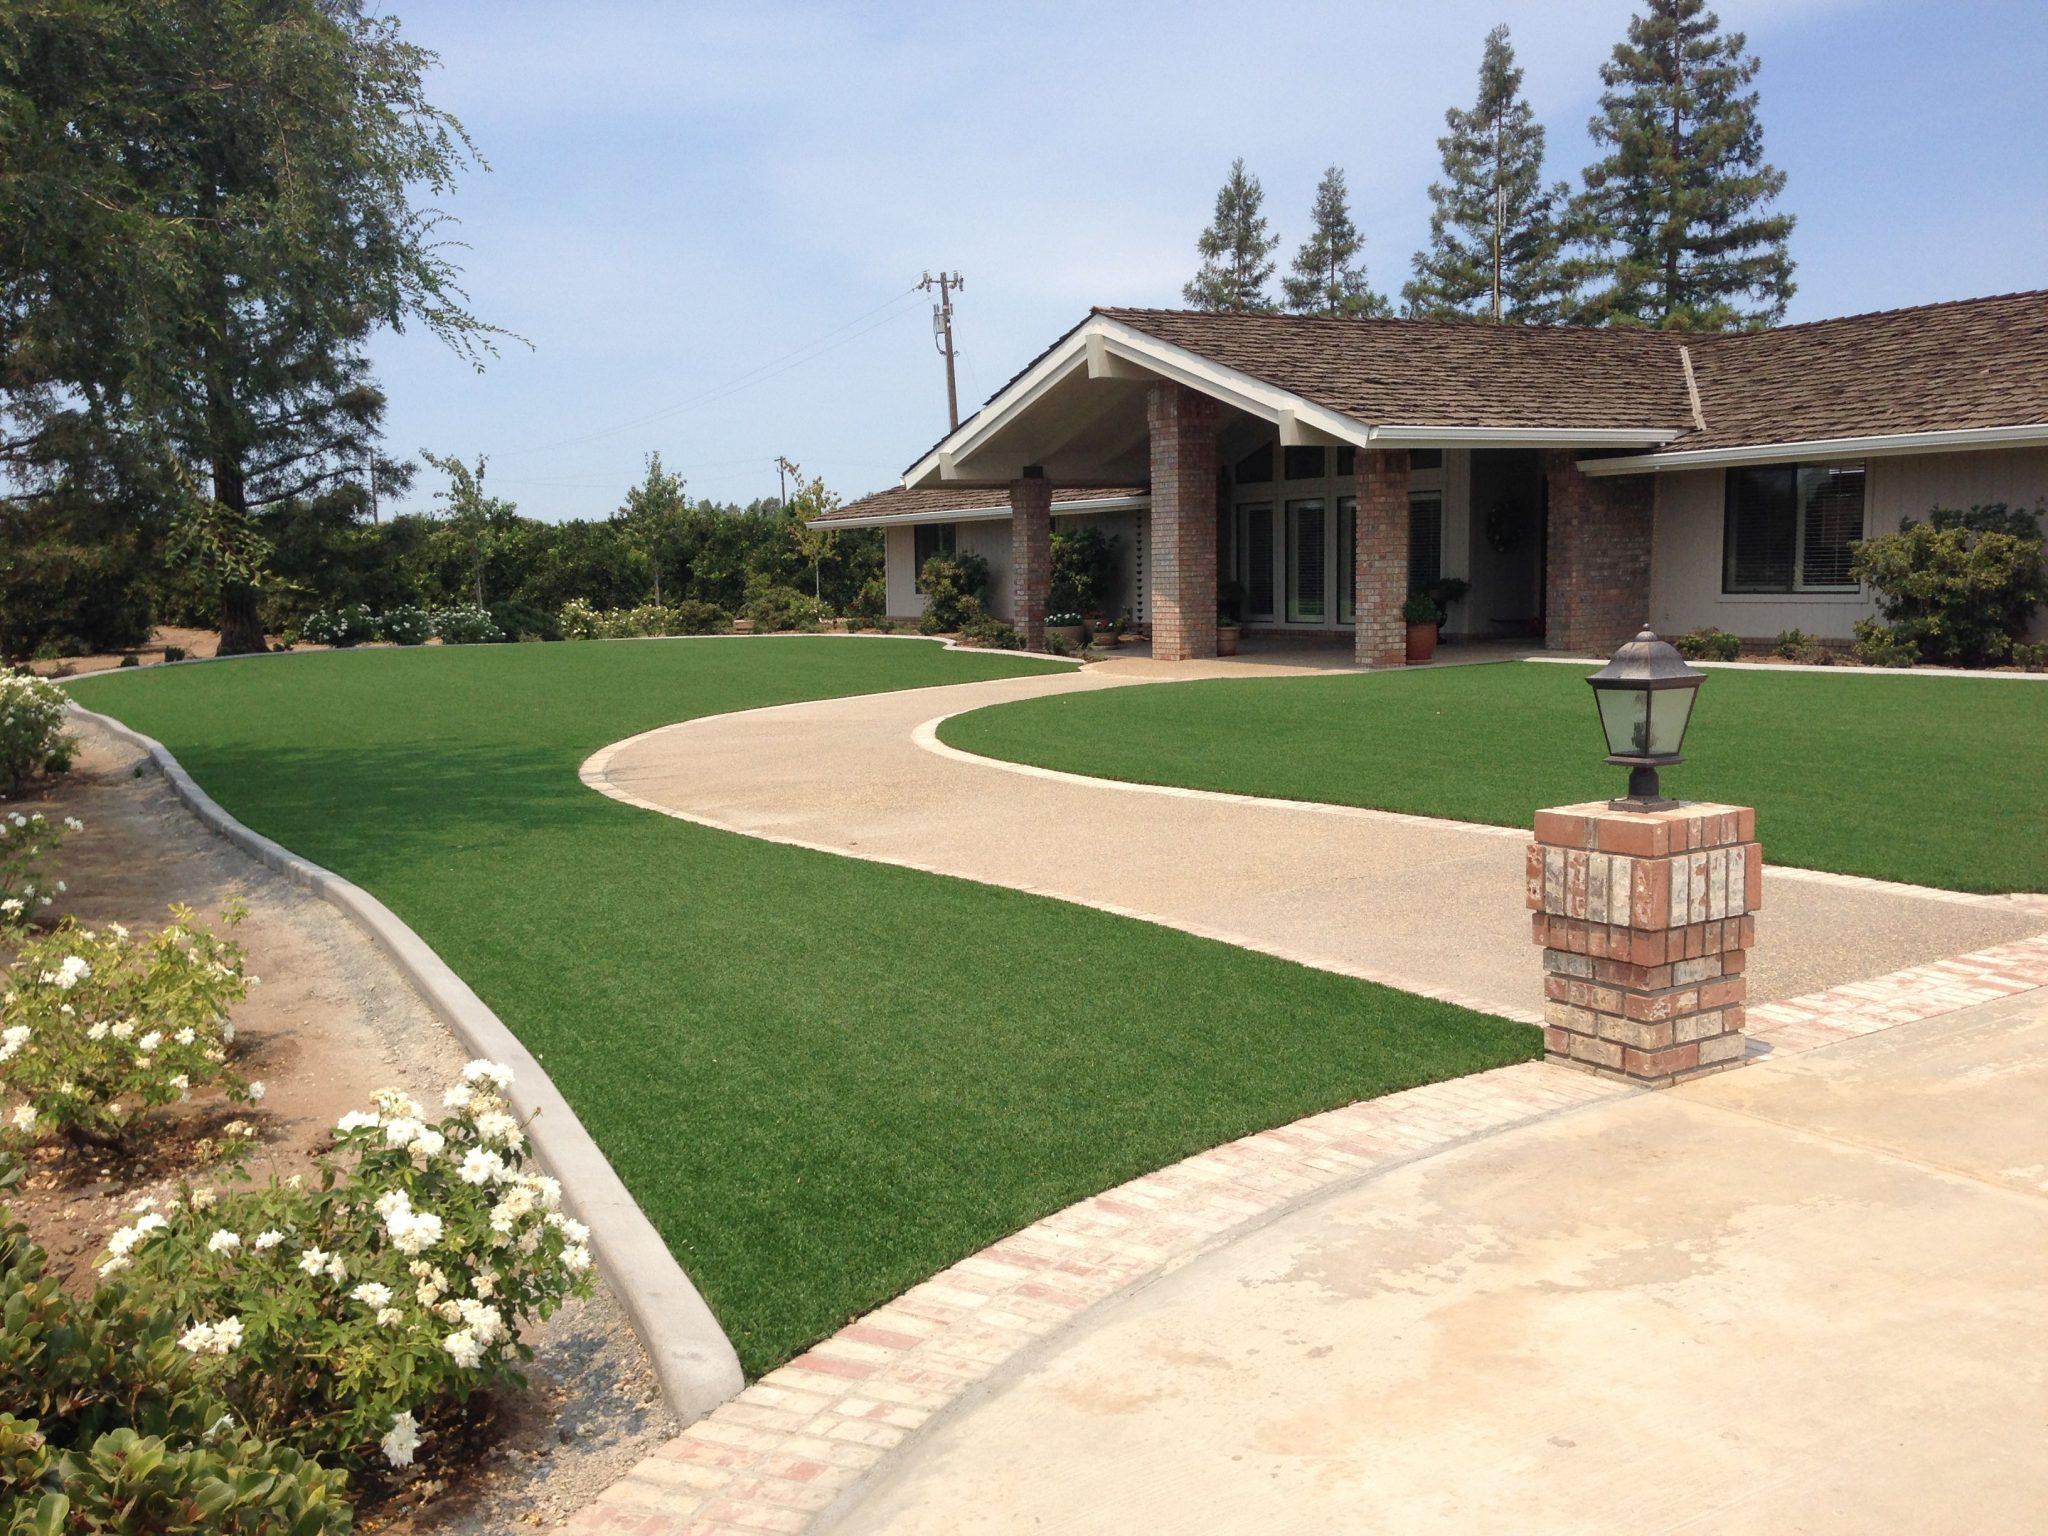 7 Landscape Edging Ideas for Artificial Grass Lawns ... on Turf Yard Ideas id=62579